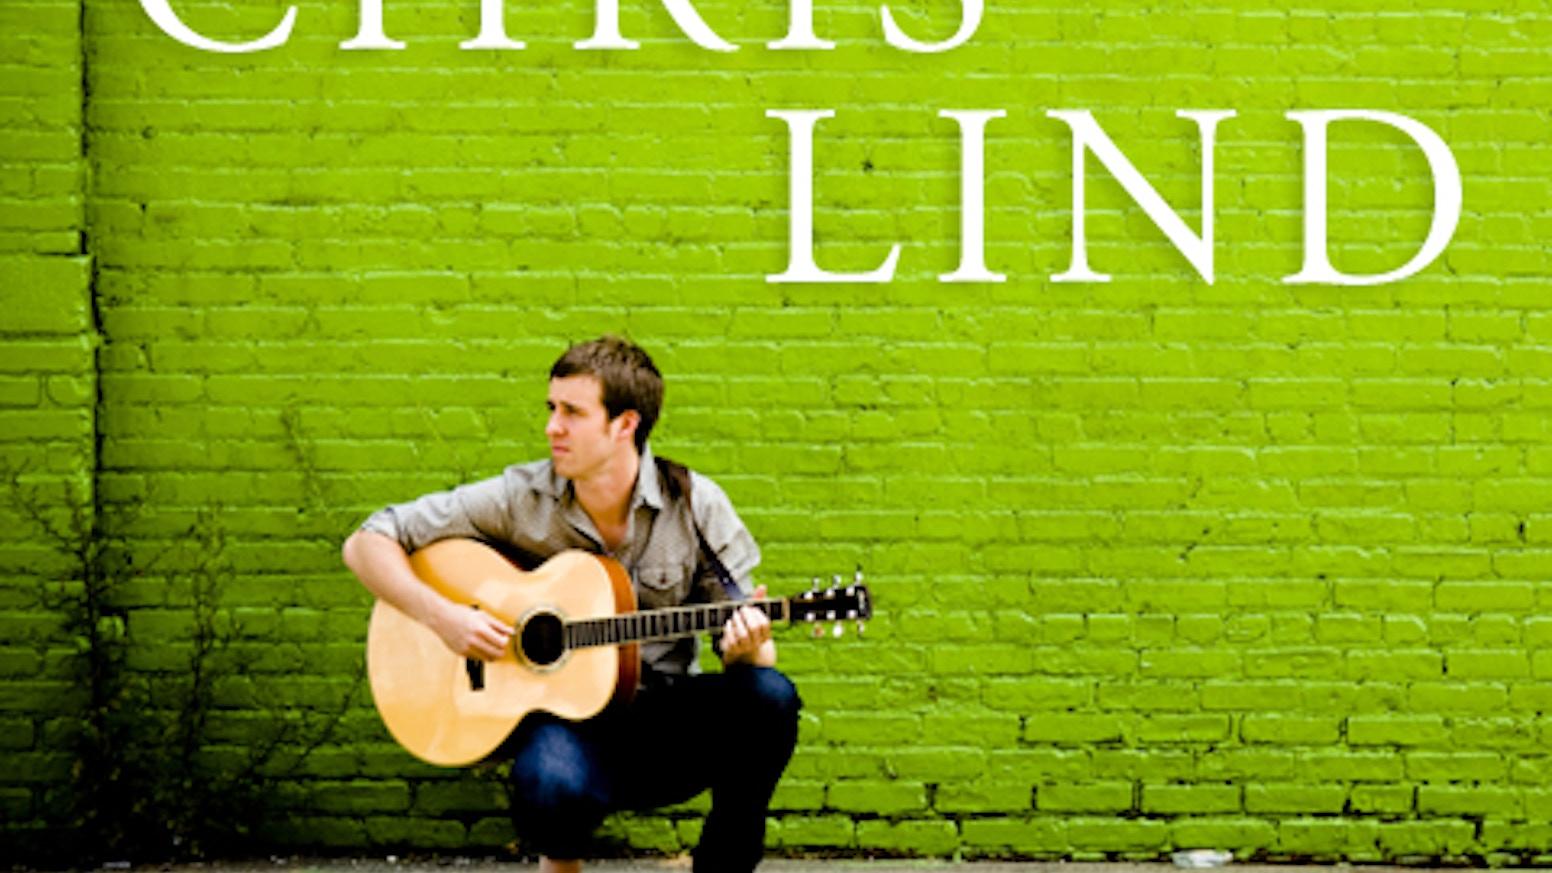 Chris Lind